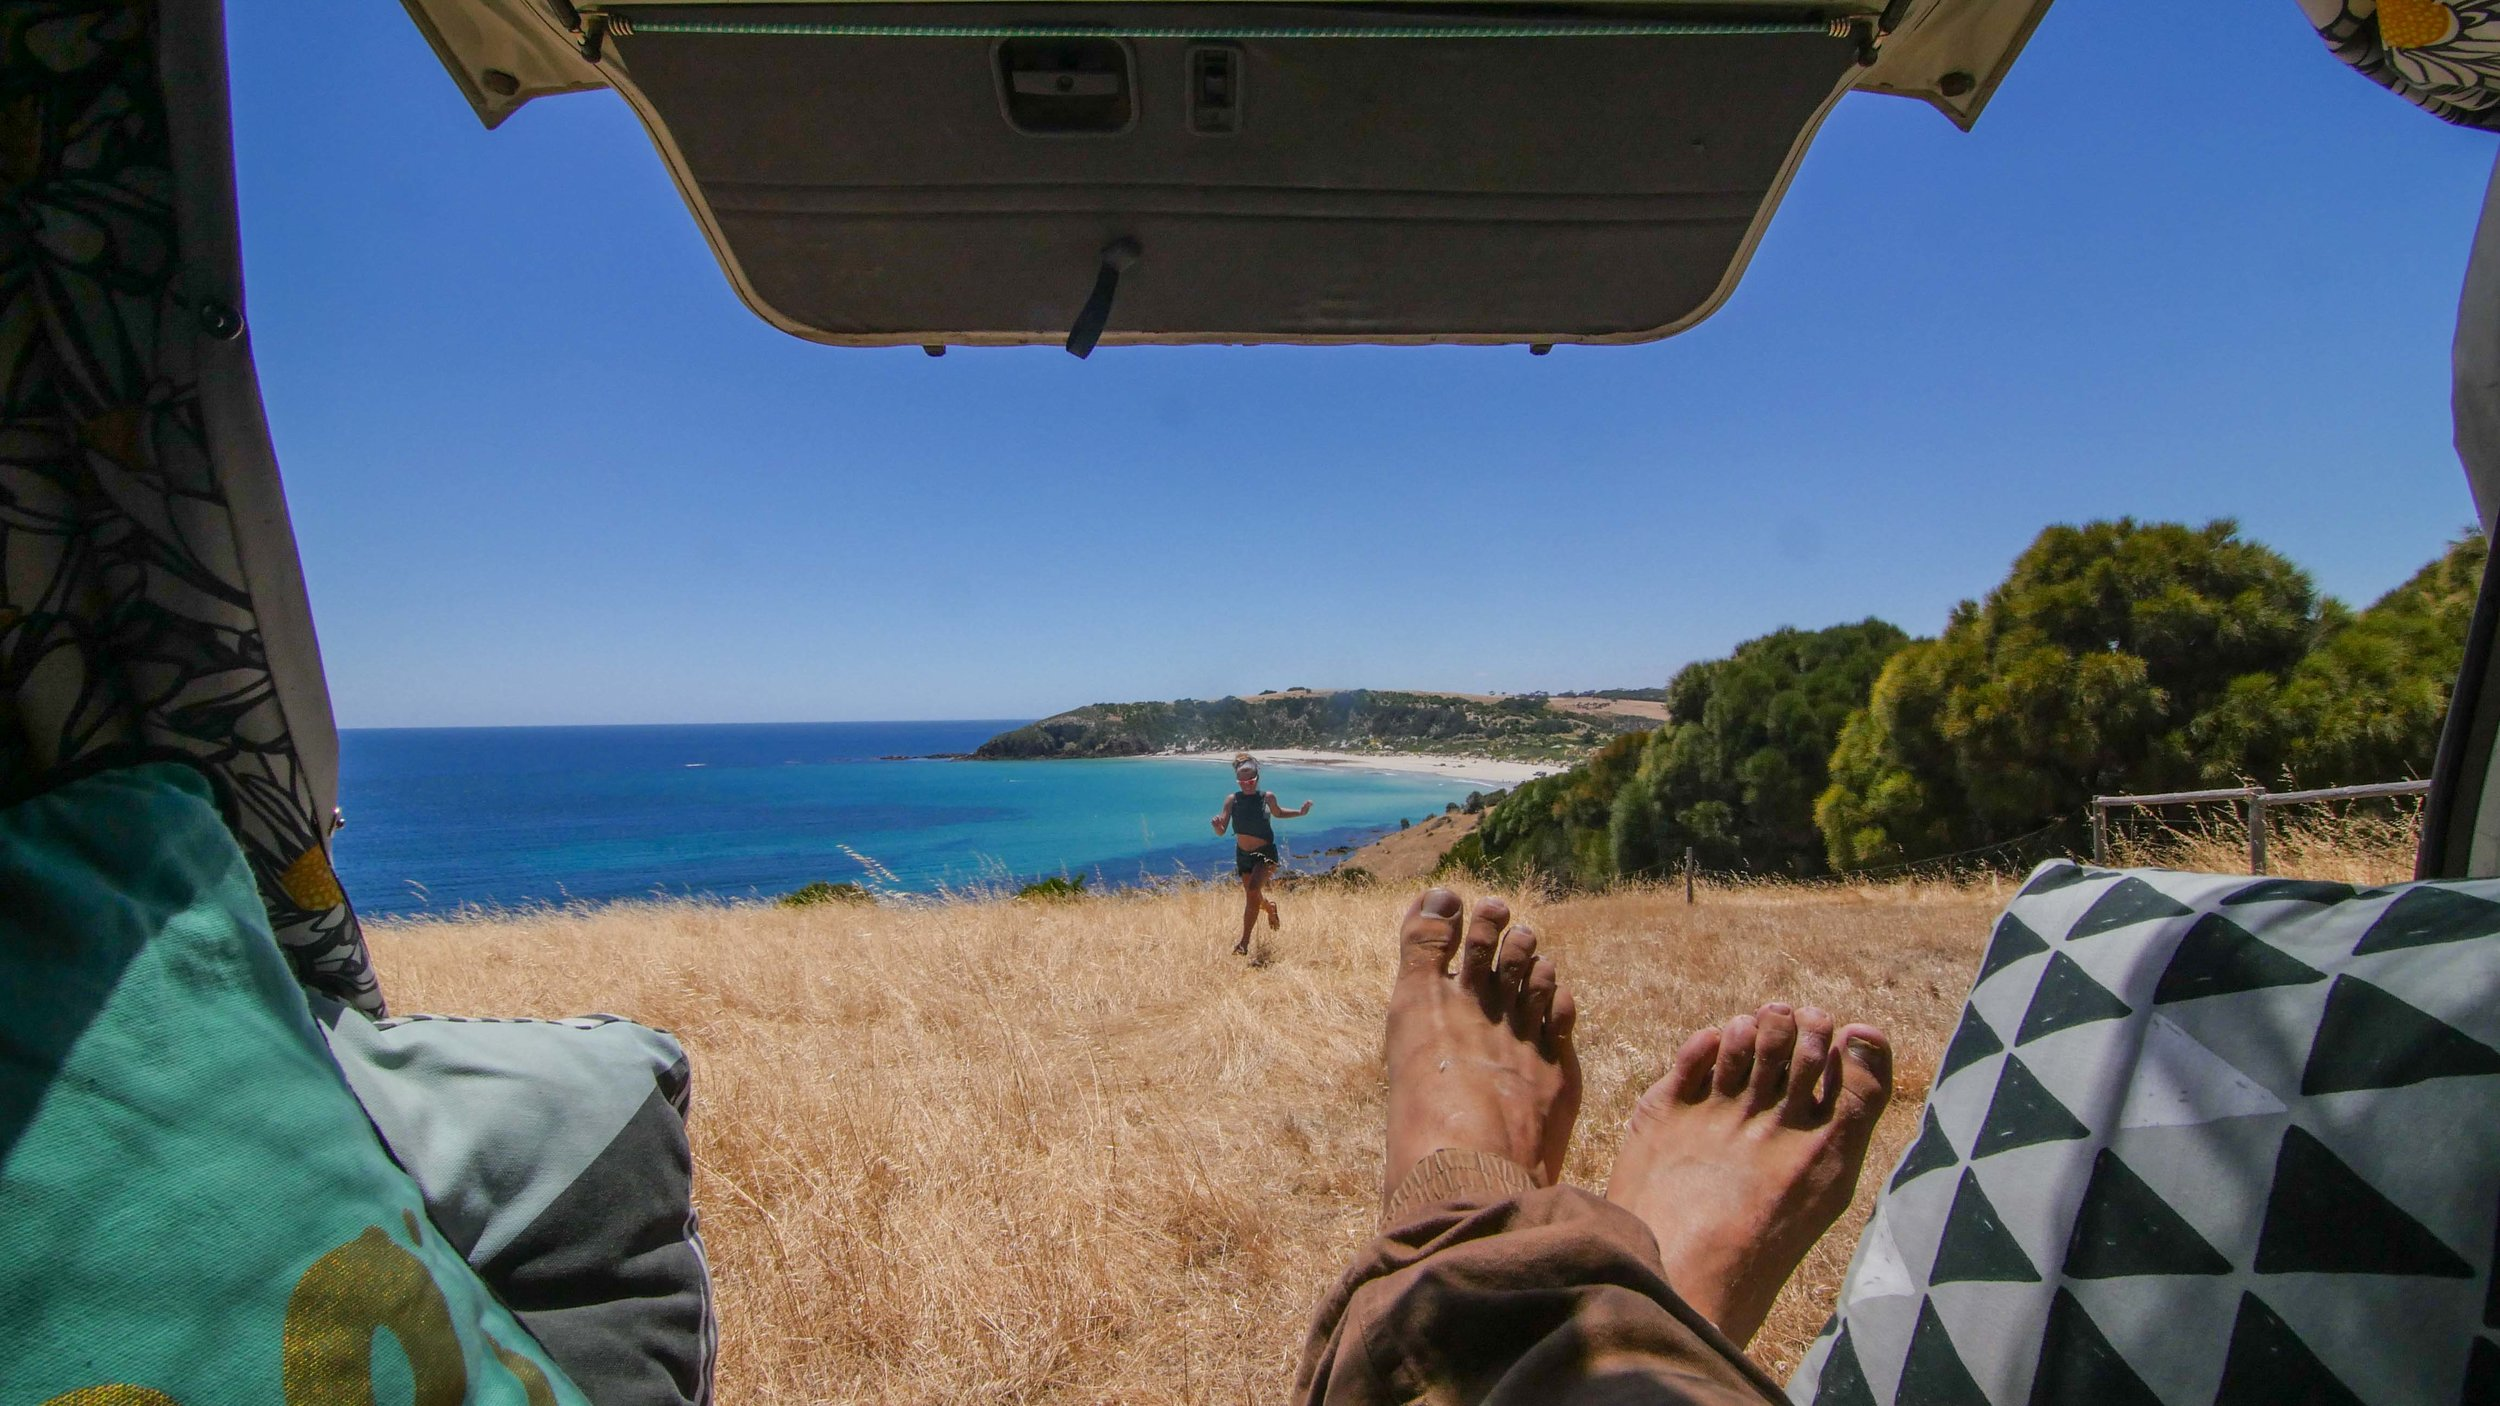 kangaroo island south australia (6 of 16).jpg